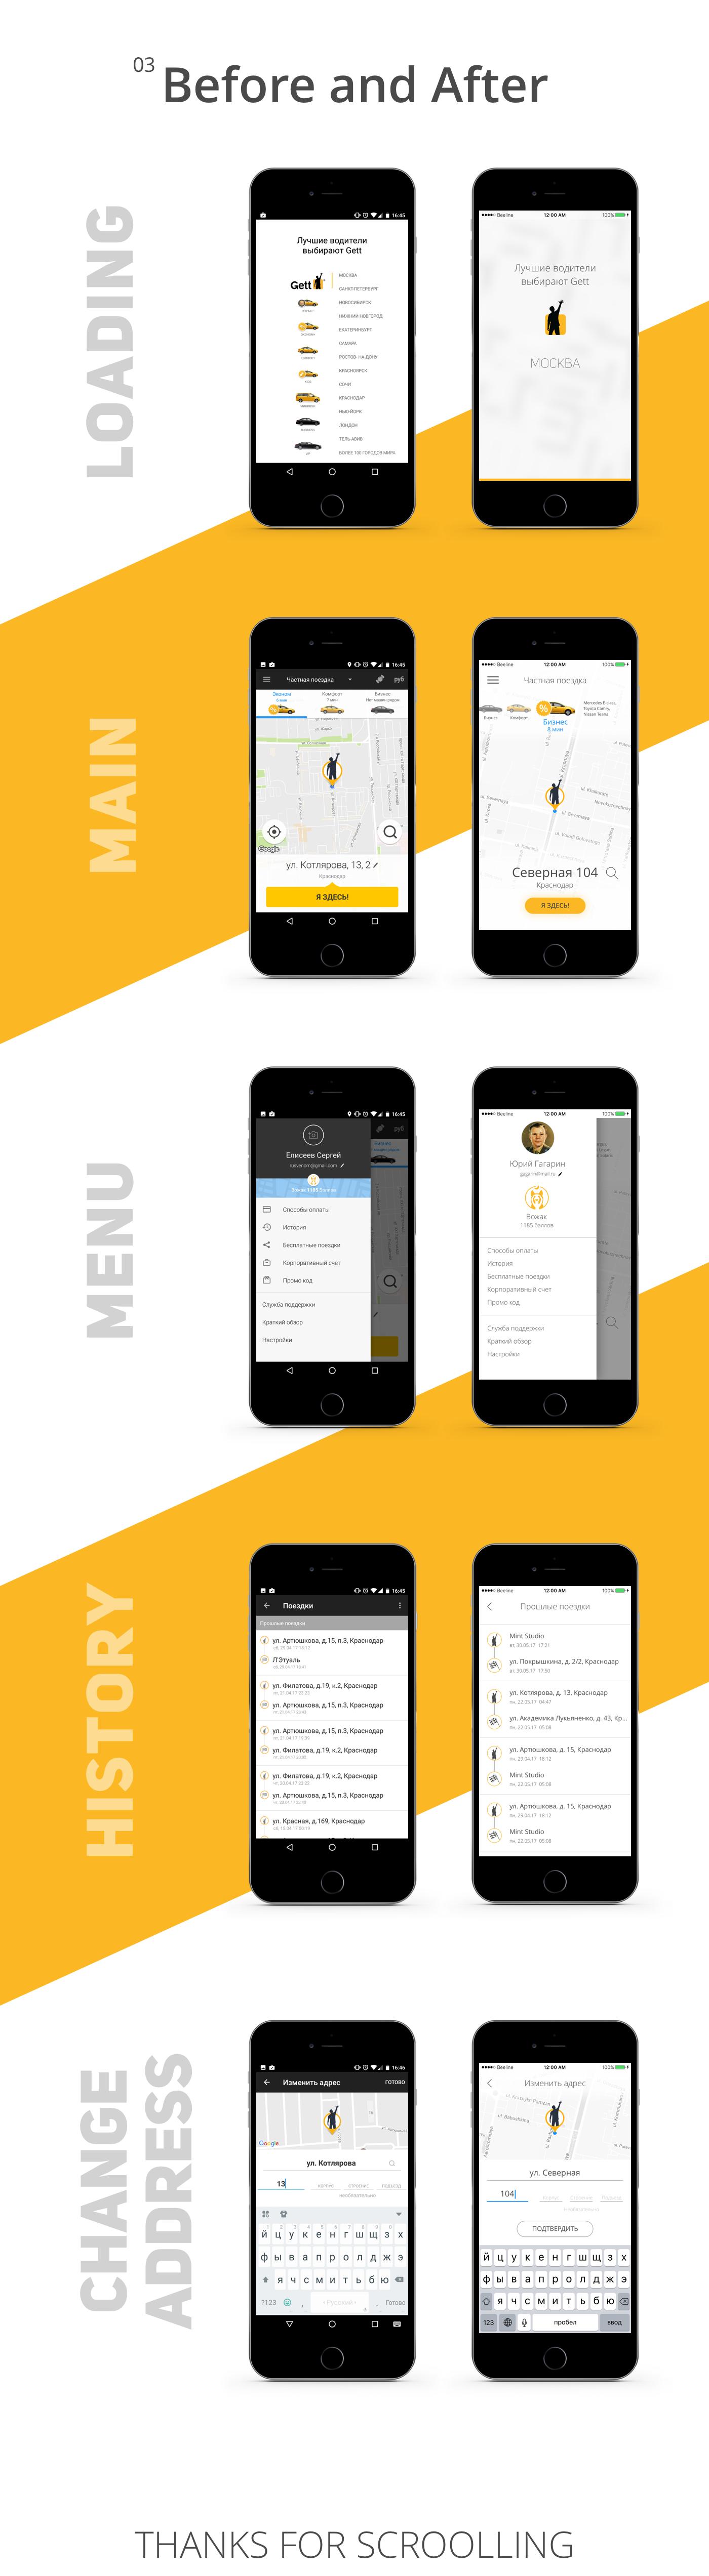 redesign concept gett taxi mobile такси доставка  перевозка приложение